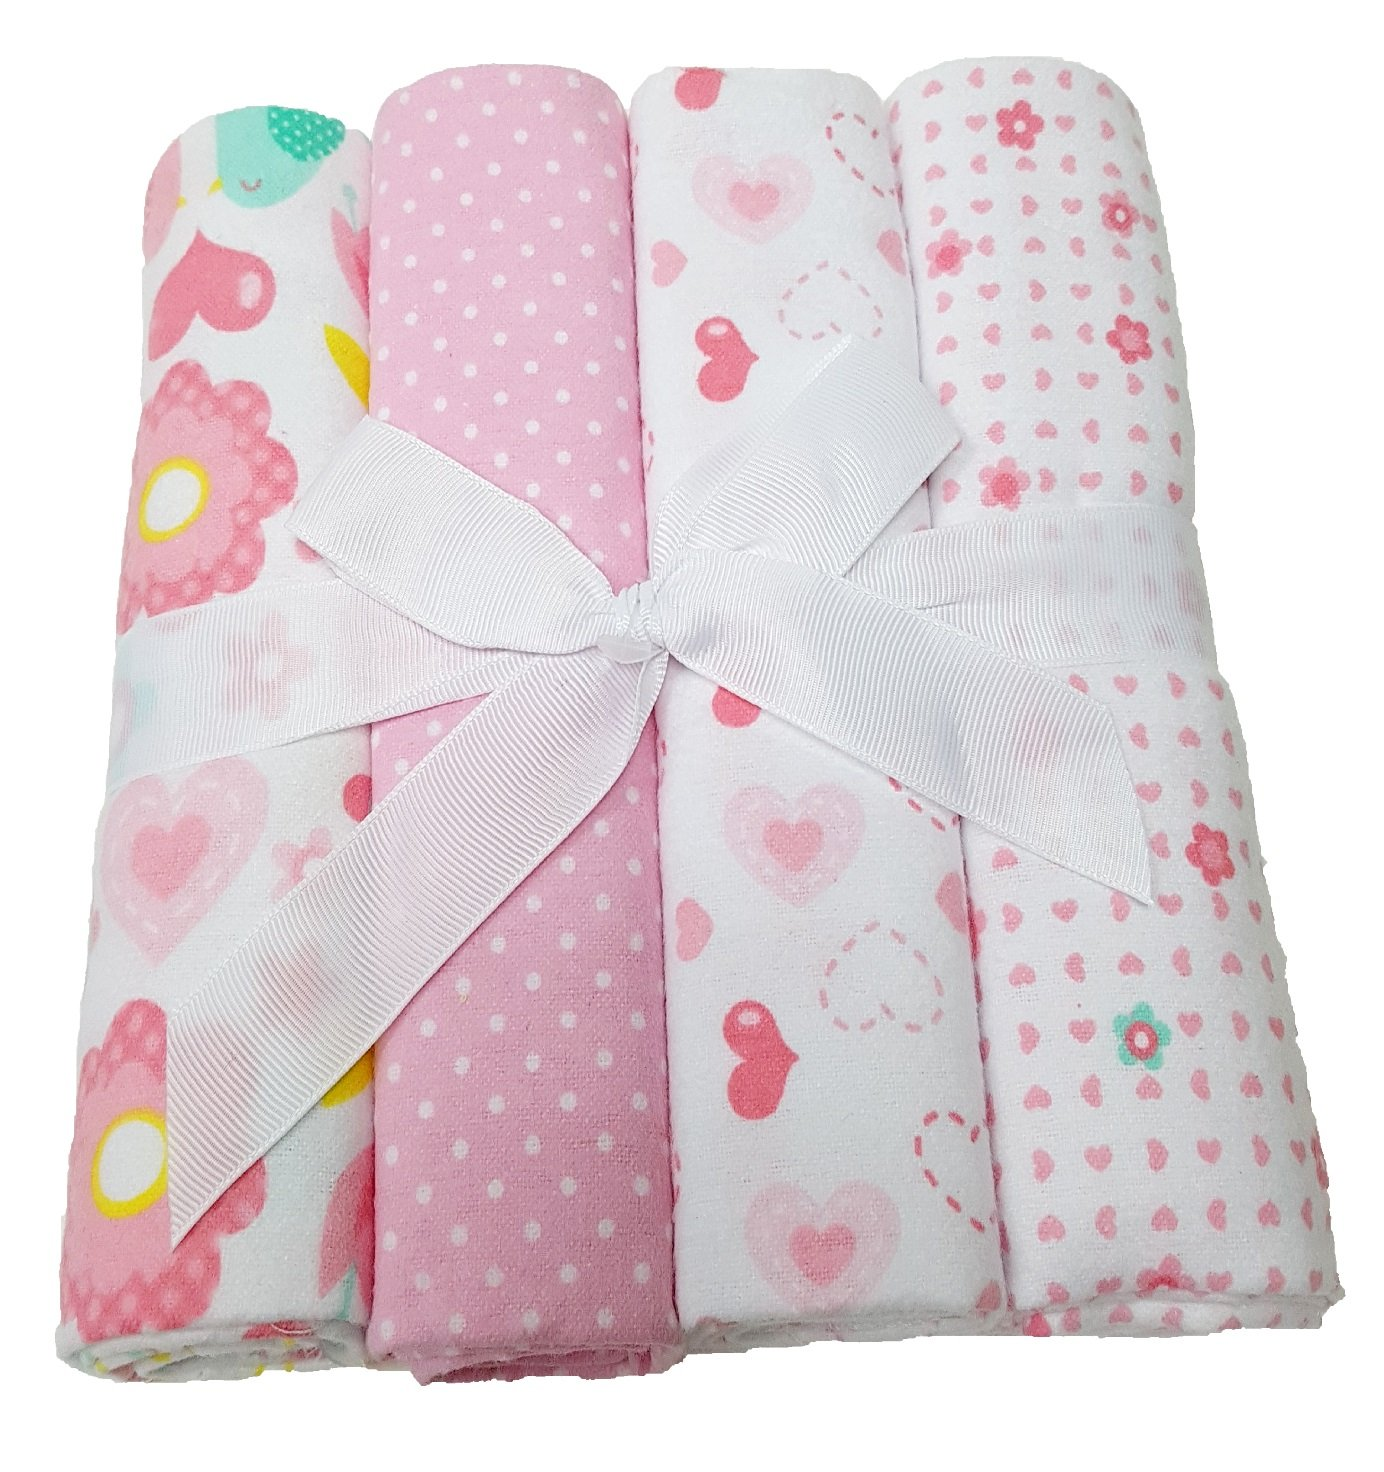 Pink Baby Moltontuch Spuckt/ücher 4er Hochwertiges Gr/ö/ße 76x76 cm 100/% Baumwolle